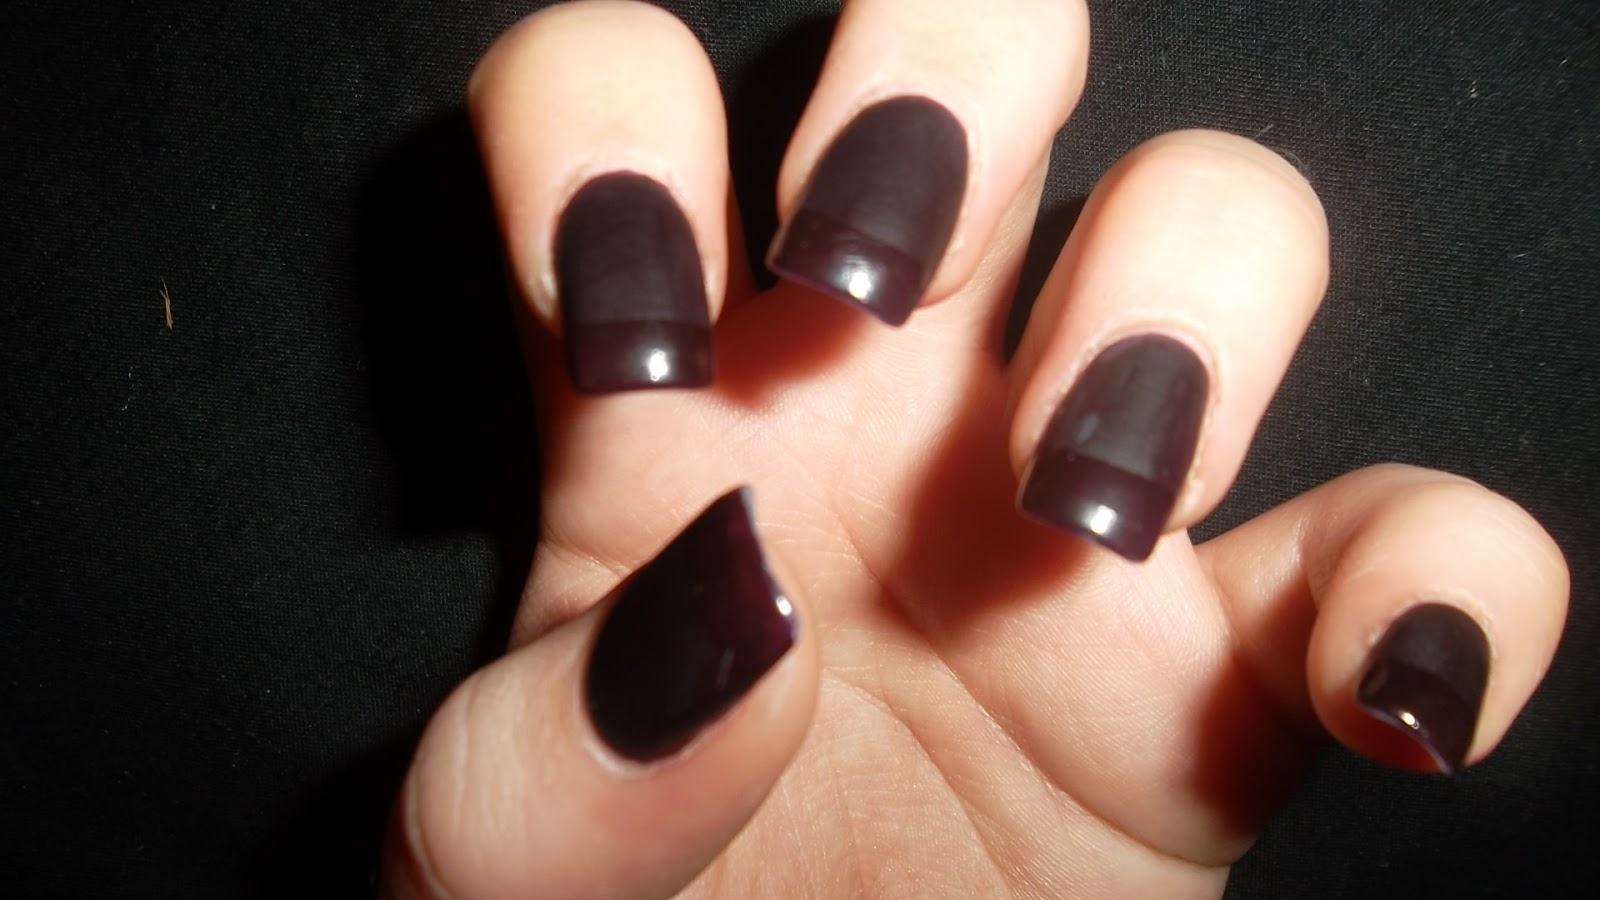 Rachel - Ellen: Matt finish acrylic nails